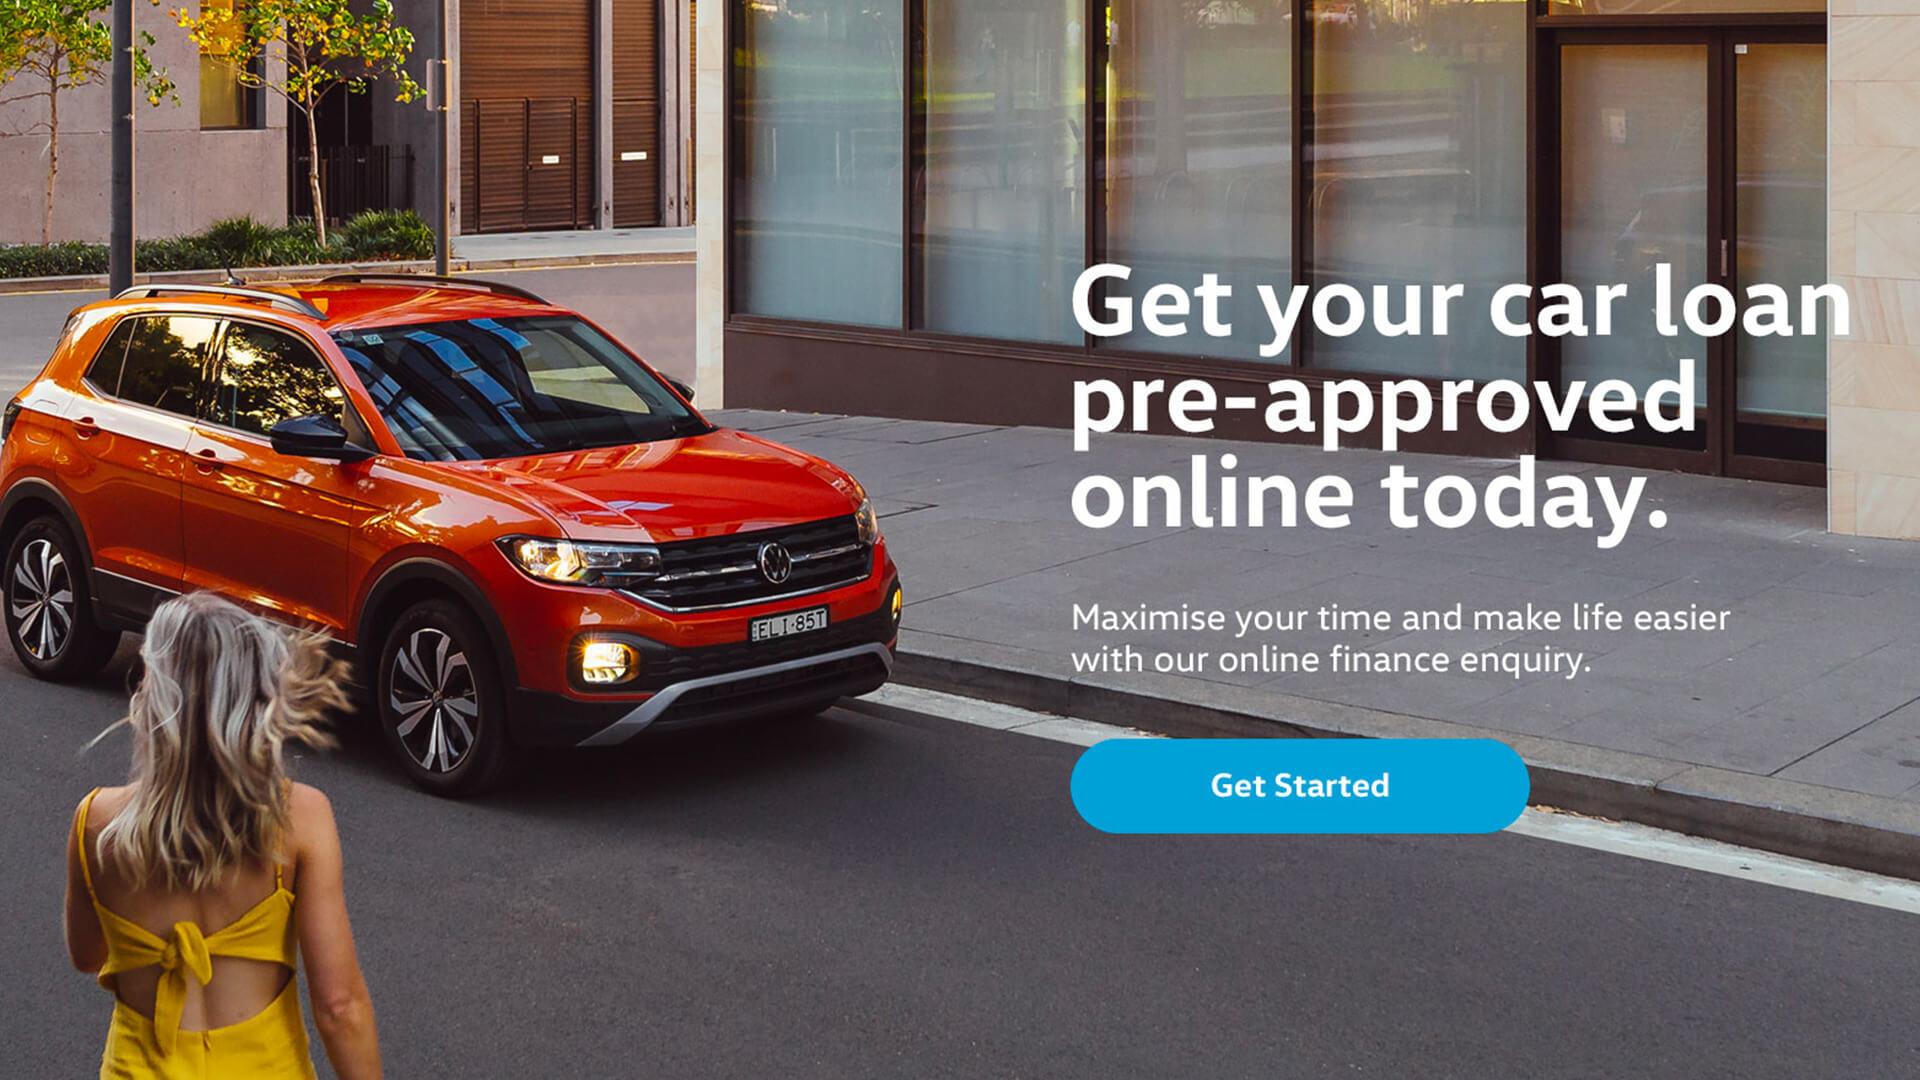 Car Finance Made Easy!